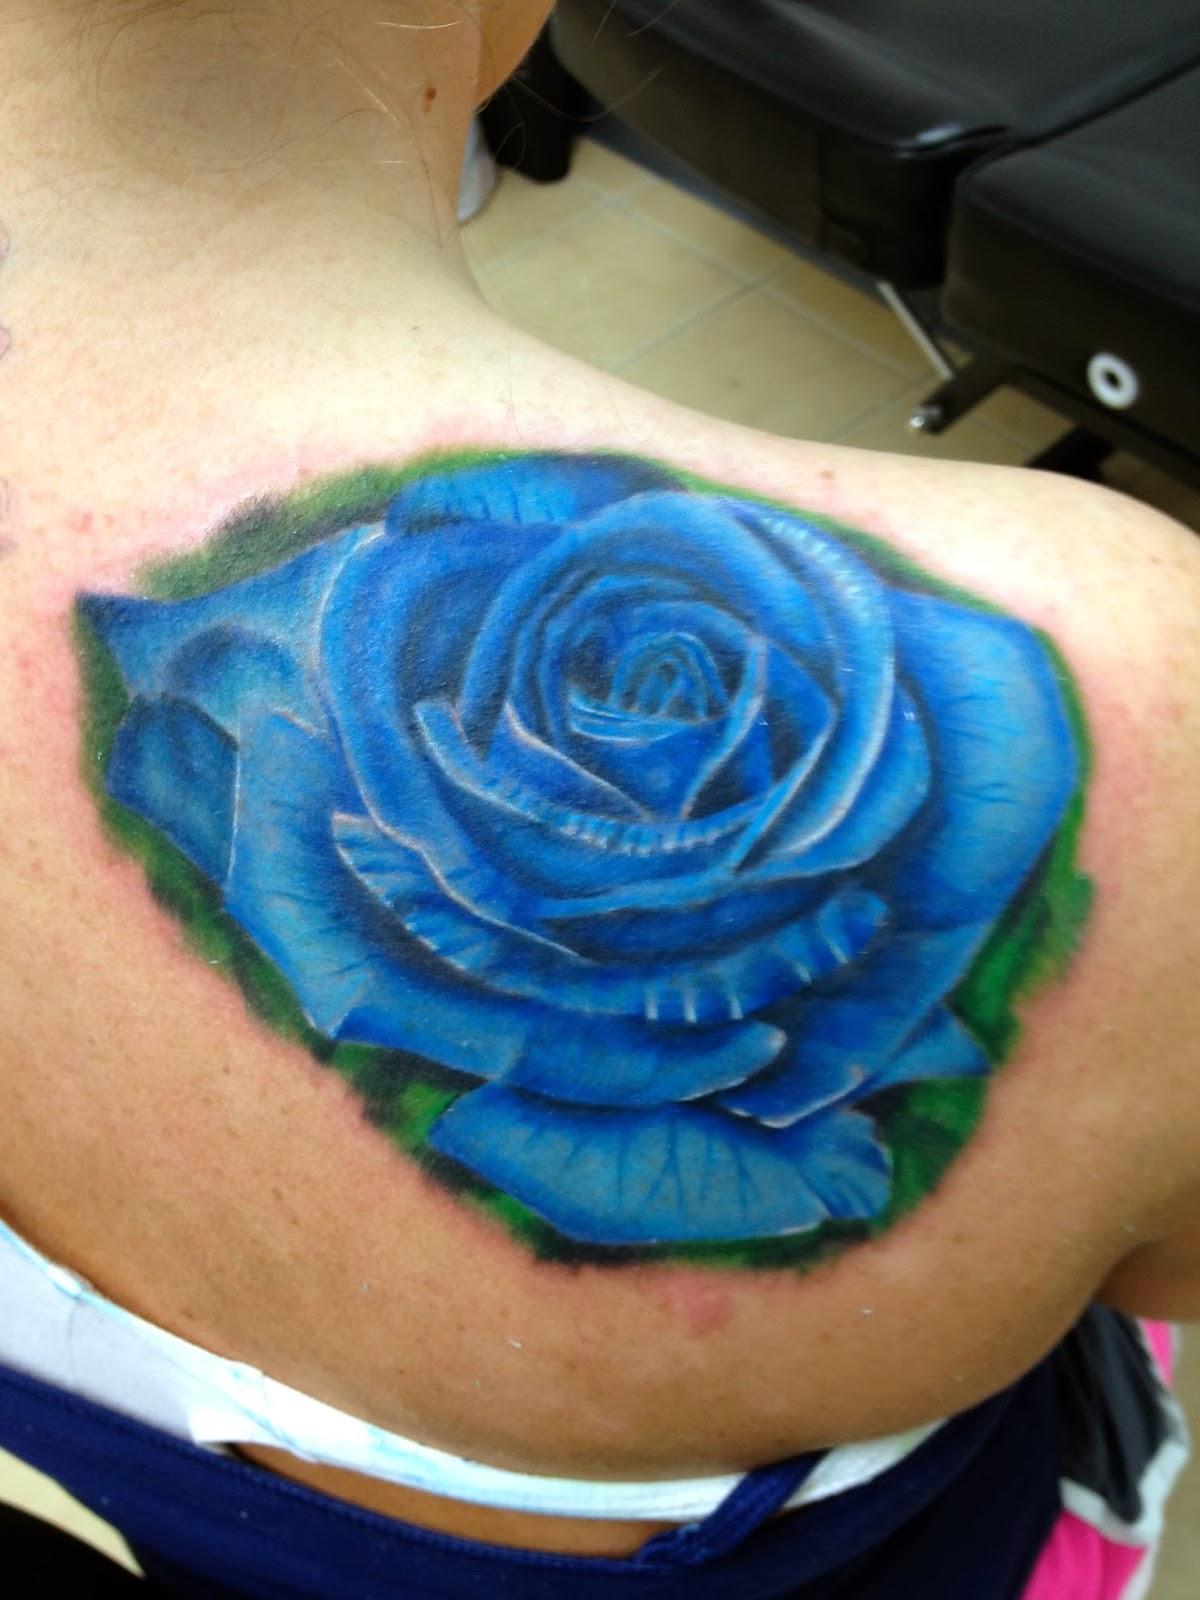 daniel nguyen tattoo realistic blue rose. Black Bedroom Furniture Sets. Home Design Ideas